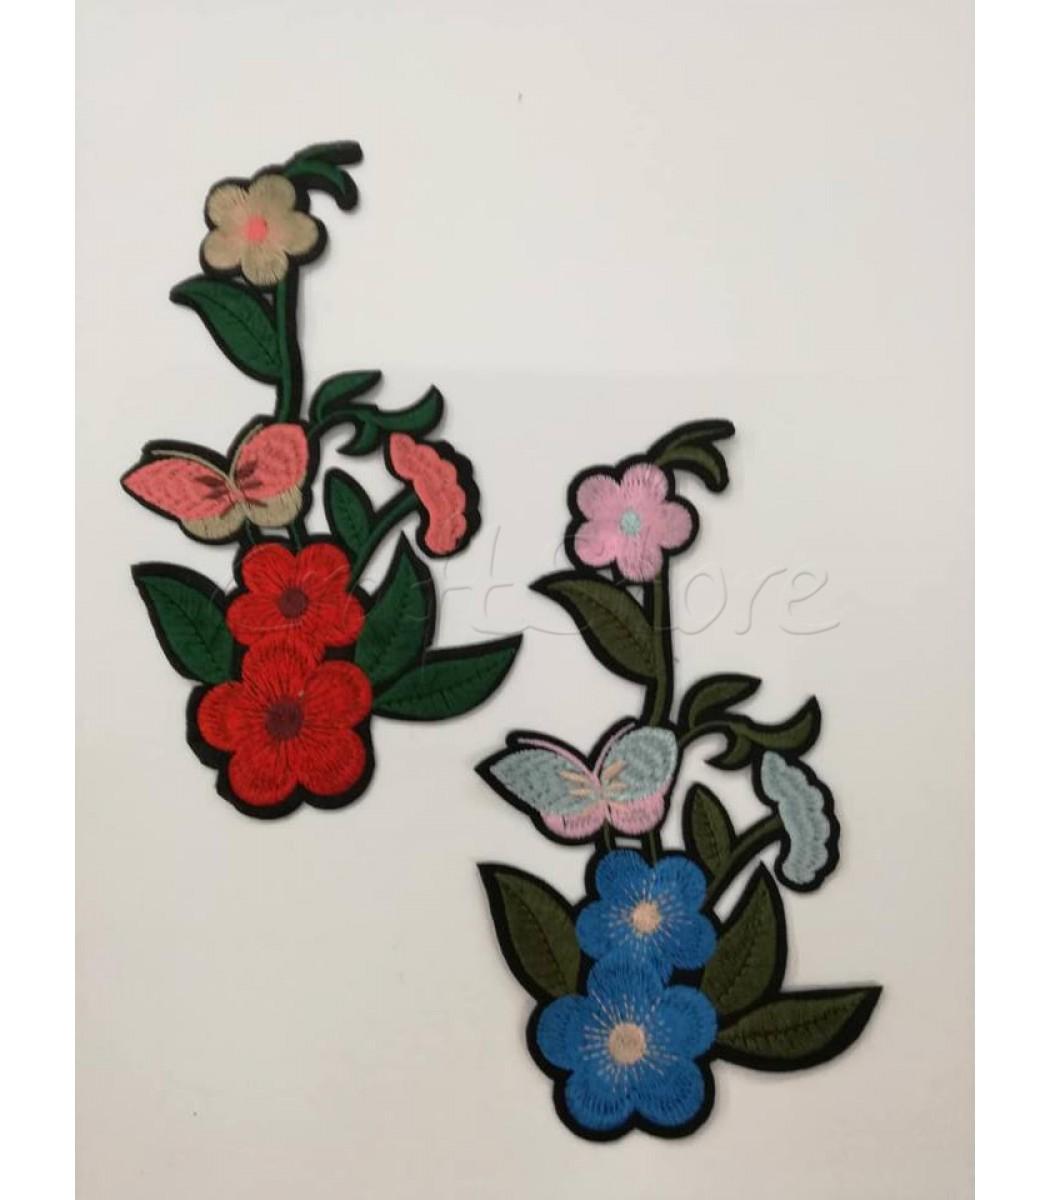 df9e37d5124 Μοτίφ Διακοσμητικό Θερμοκολλητικό Λουλούδια με Πεταλούδες 19εκ. / 1 τμχ